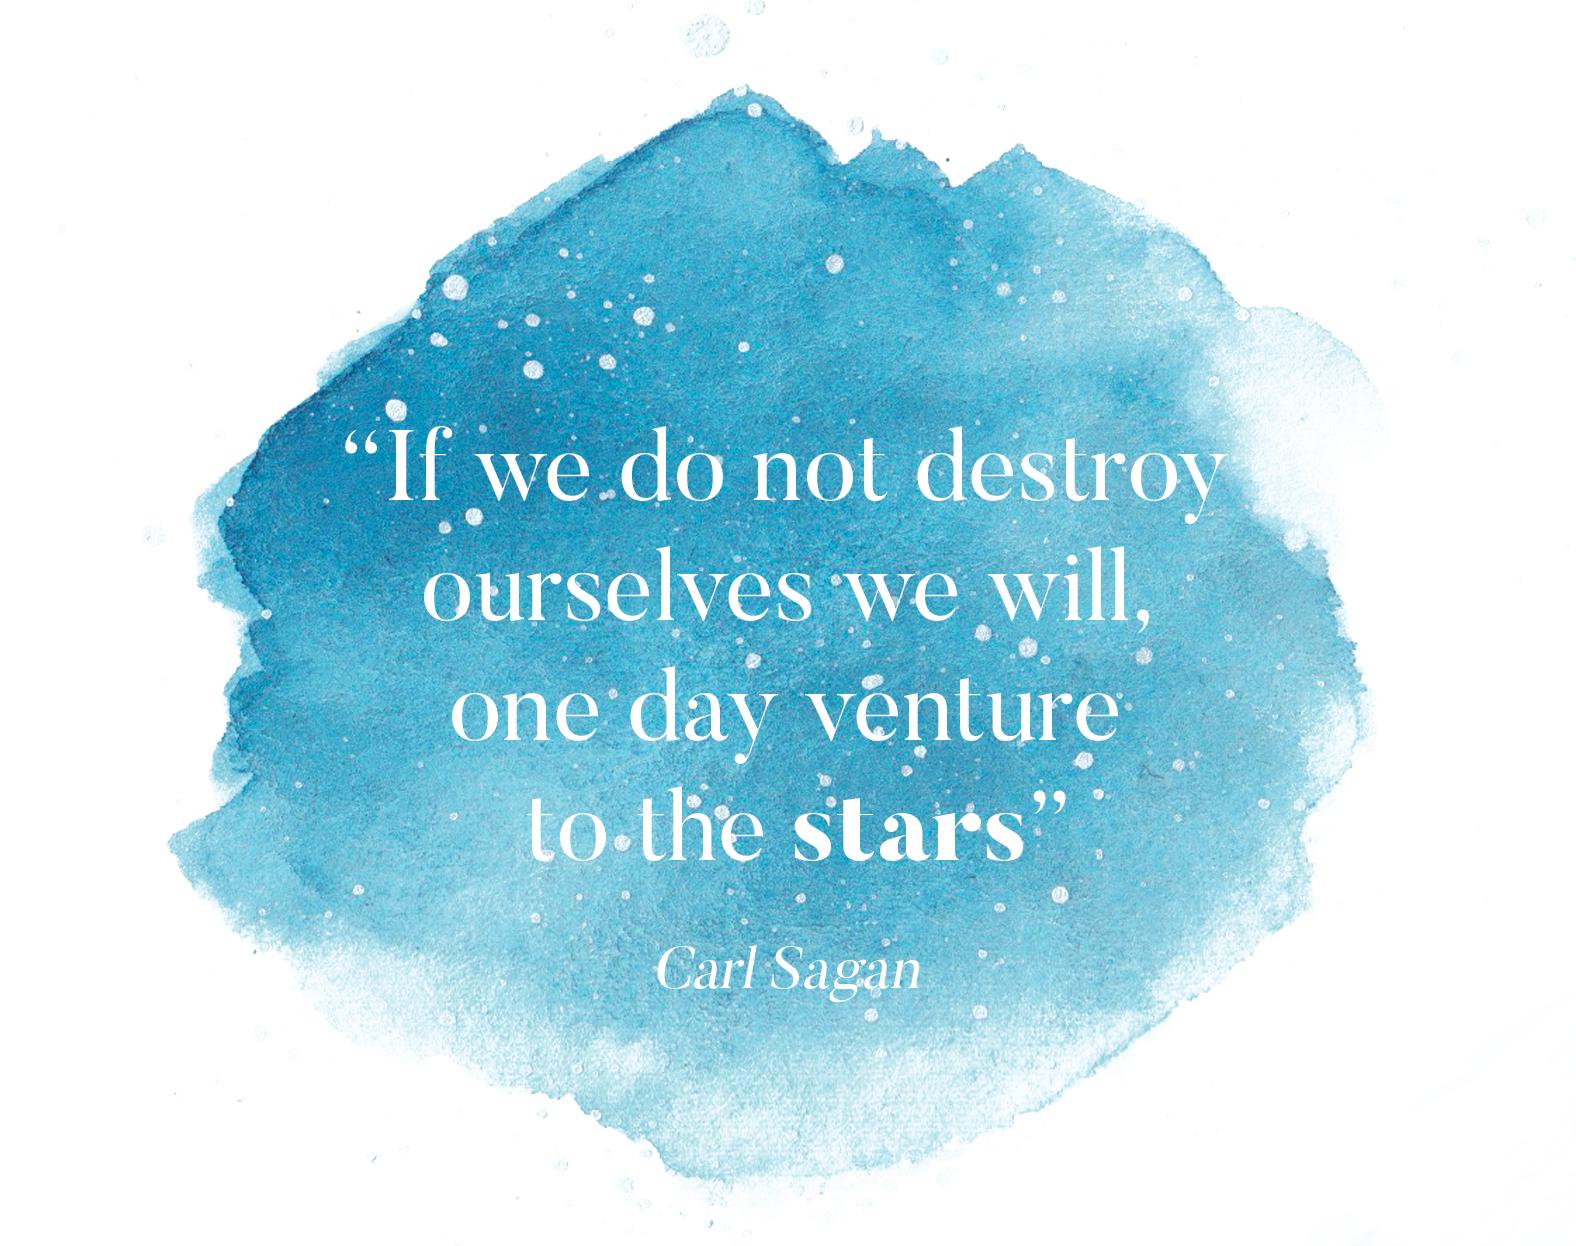 CarlSagan_inspiration.jpg